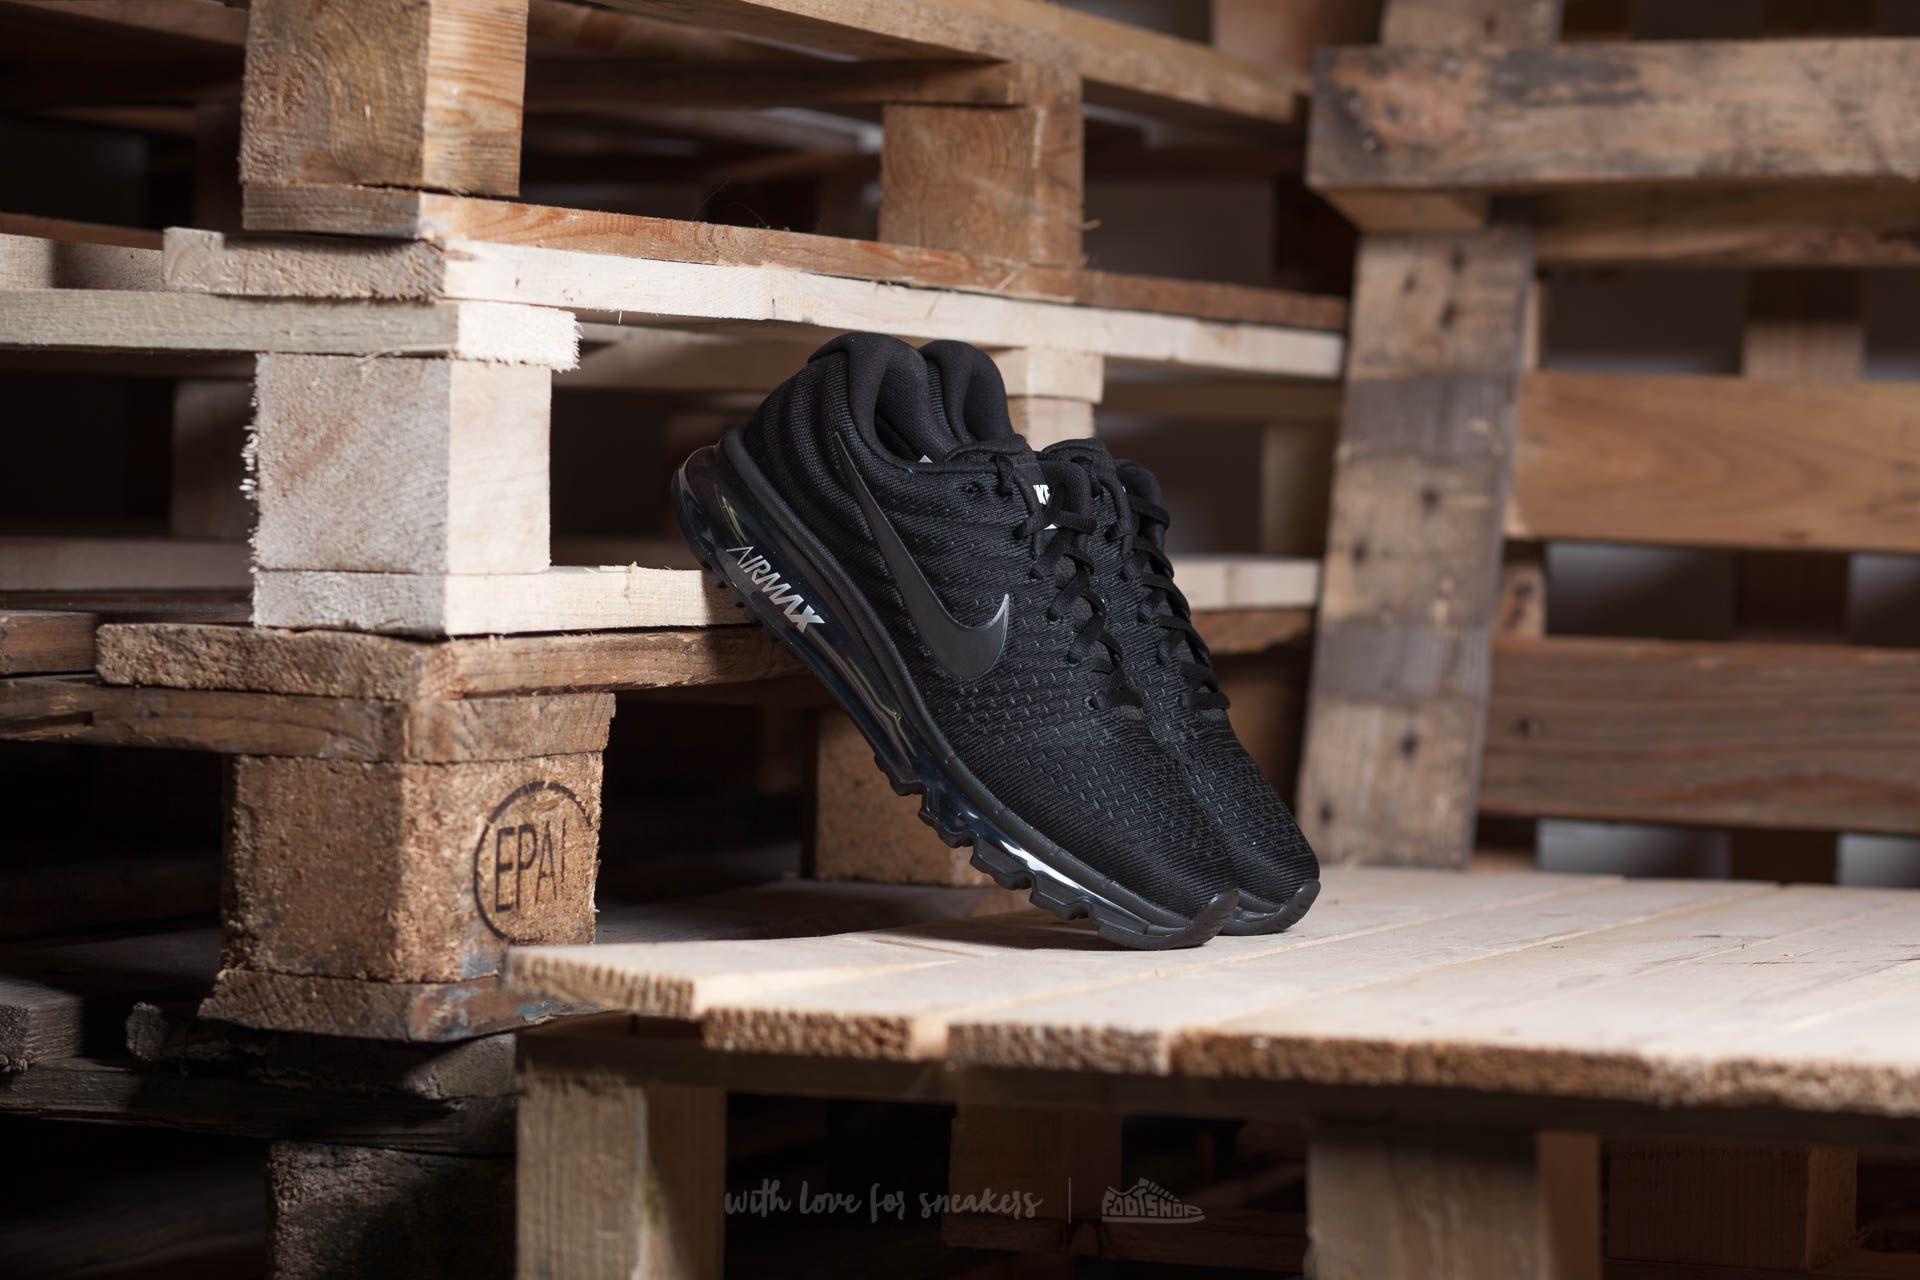 e08118d7af6da Nike Wmns Air Max 2017 Black  Black  Black a muy buen precio 192 €